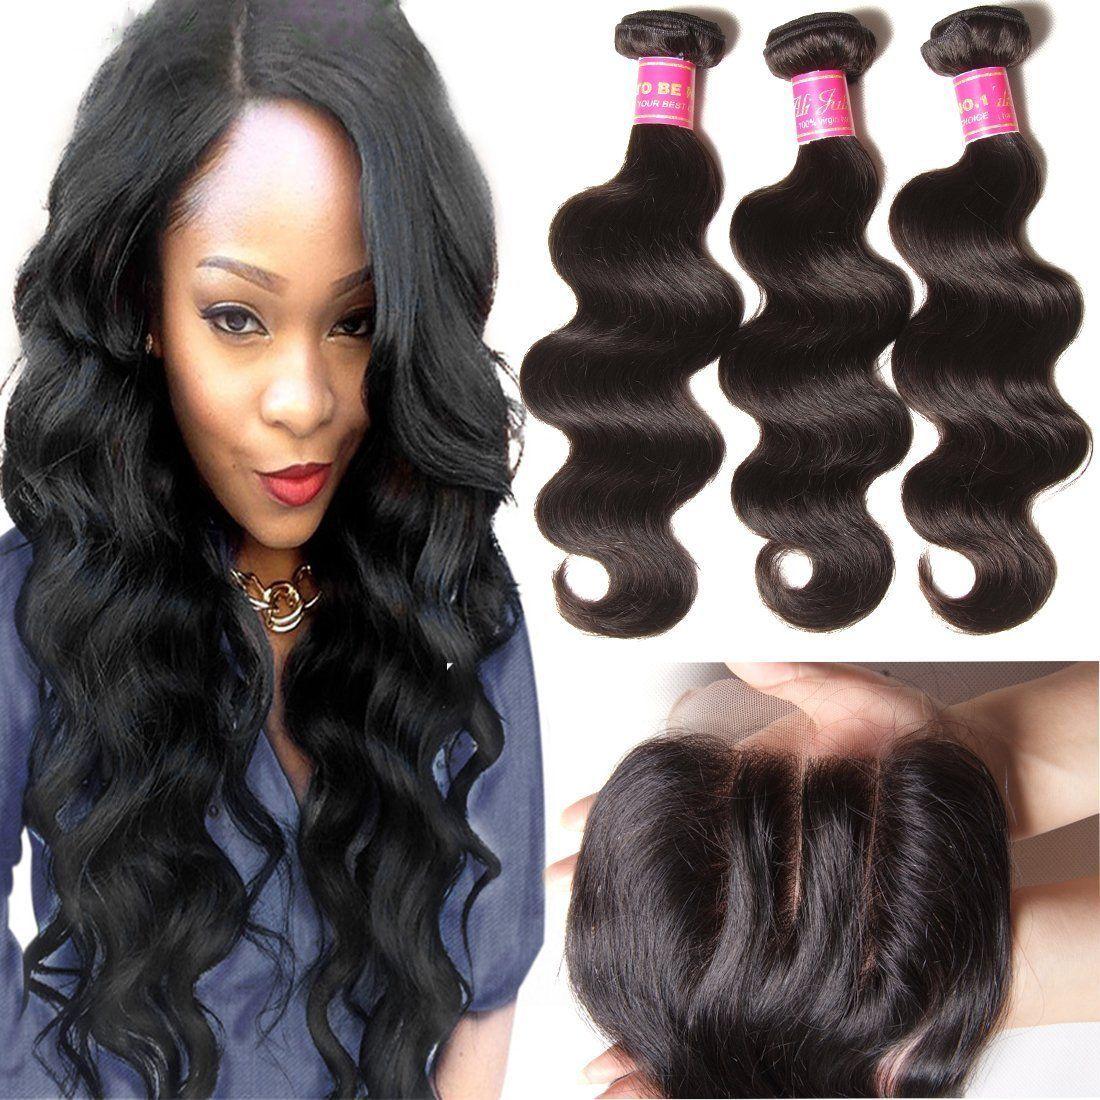 Ali Julia 12 14 16 10 Inch Brazilian Virgin Body Wave Hair Weft 3 Bundles With 1pc 44 Three Part Lace Clos Human Hair Weave Extensions Hair Weft Body Wave Hair